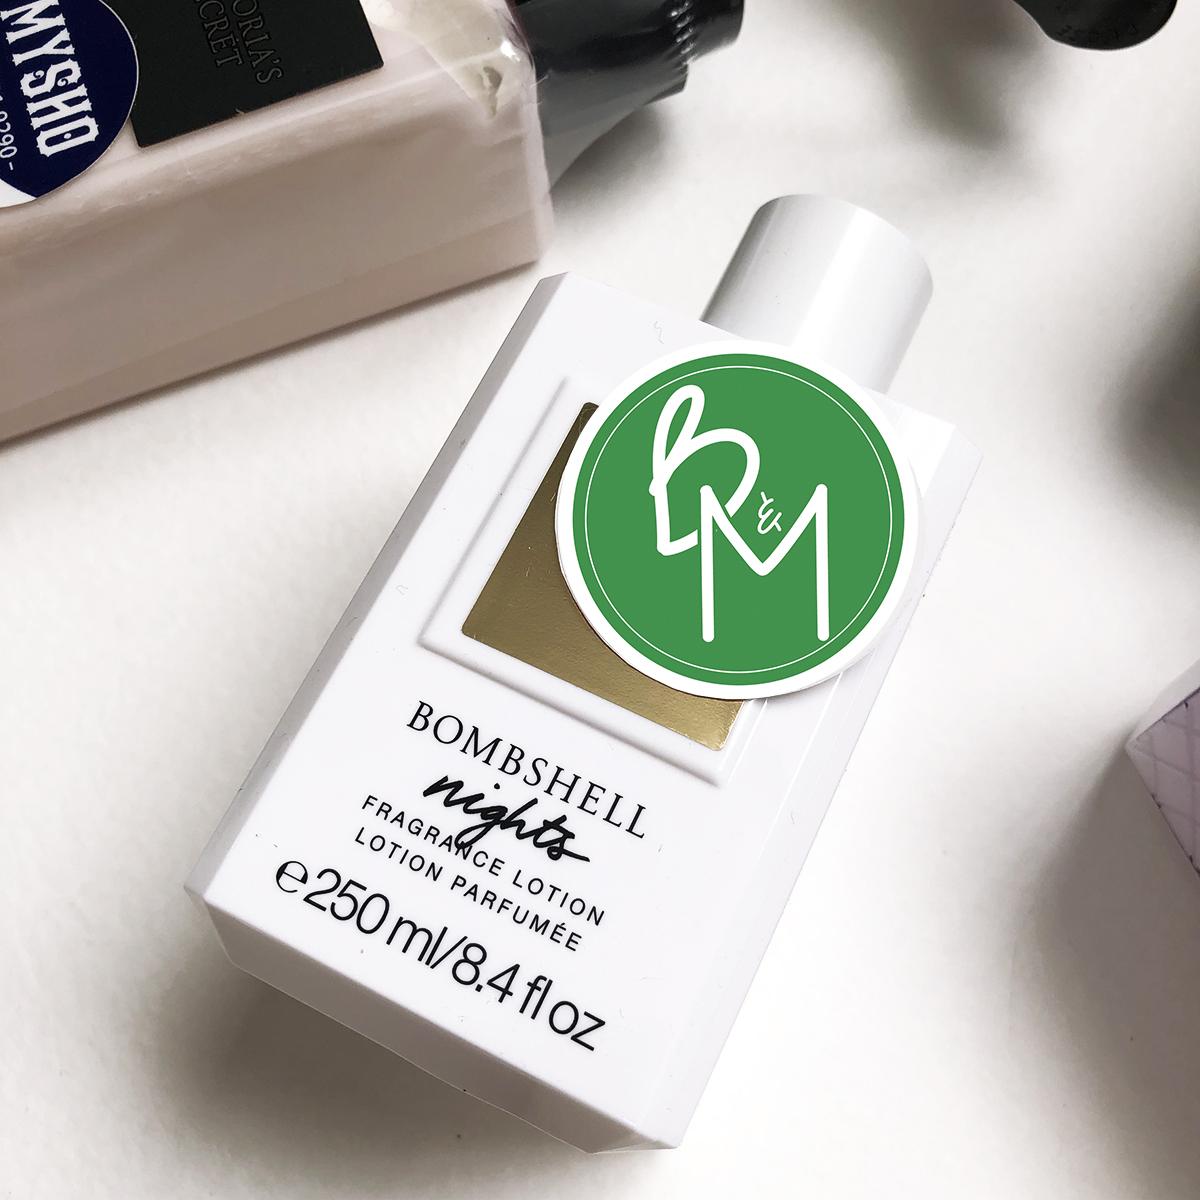 250ml  Sữa dưỡng thể Victoria's Secret Bombshell Nights Fragrance Lotion